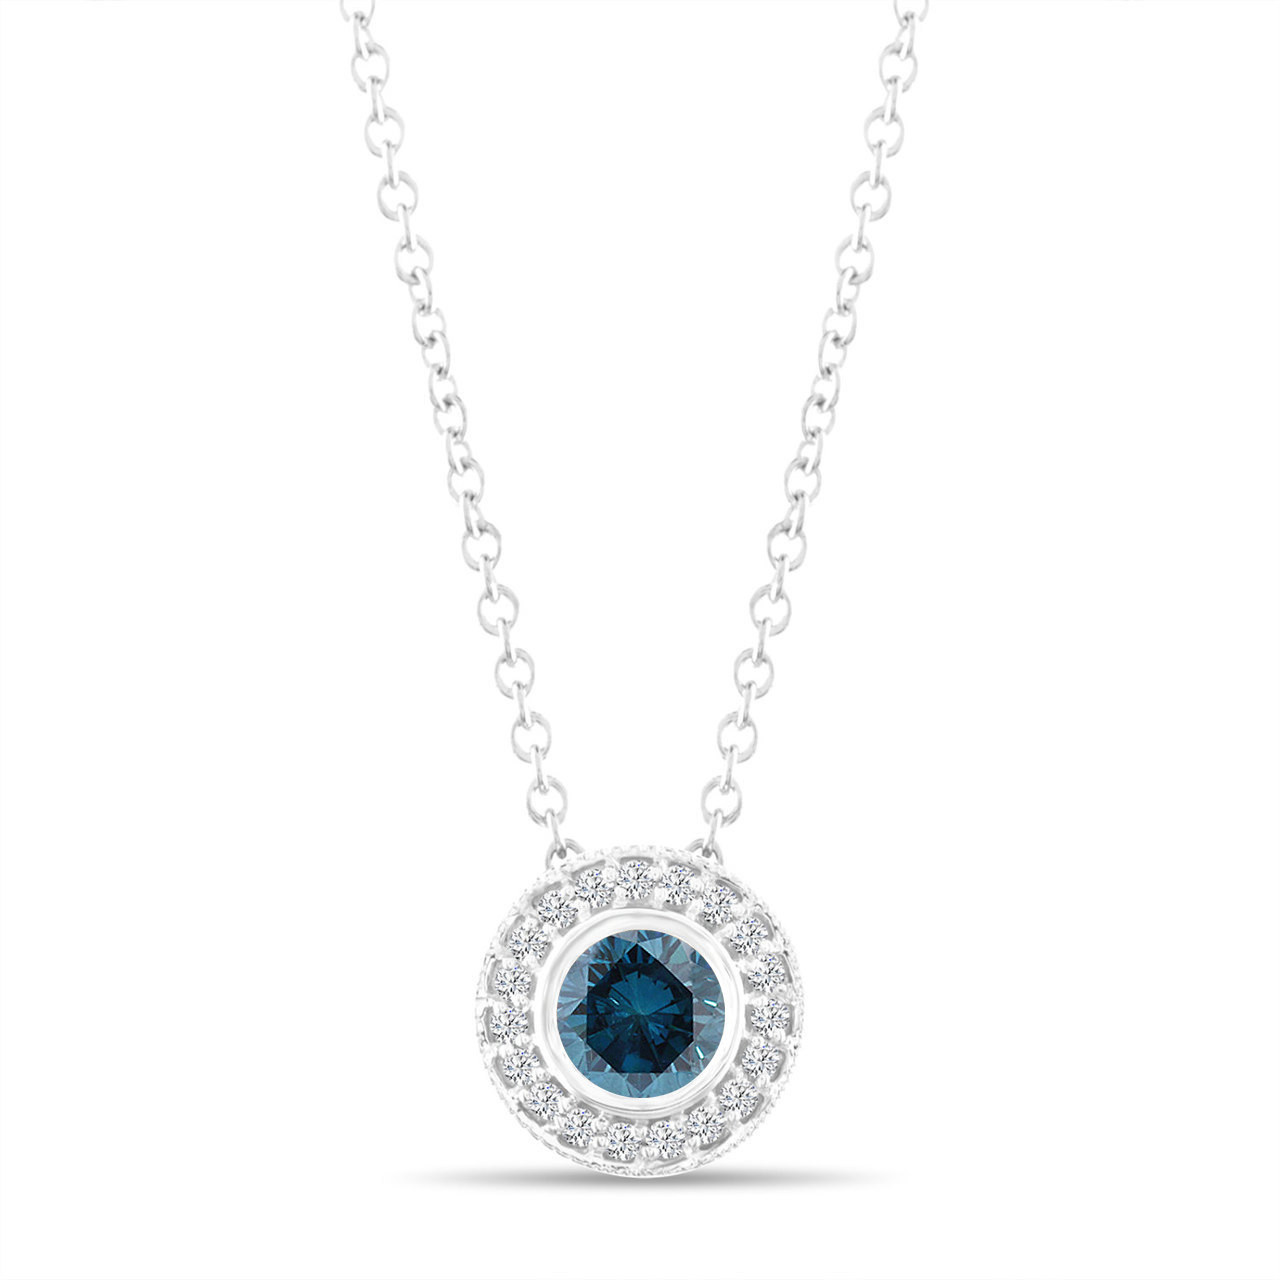 Fancy blue diamond pendant necklace 14k white gold 045 carat halo fancy blue diamond pendant necklace 14k white gold 045 carat halo bezel and micro pave set handmade aloadofball Image collections